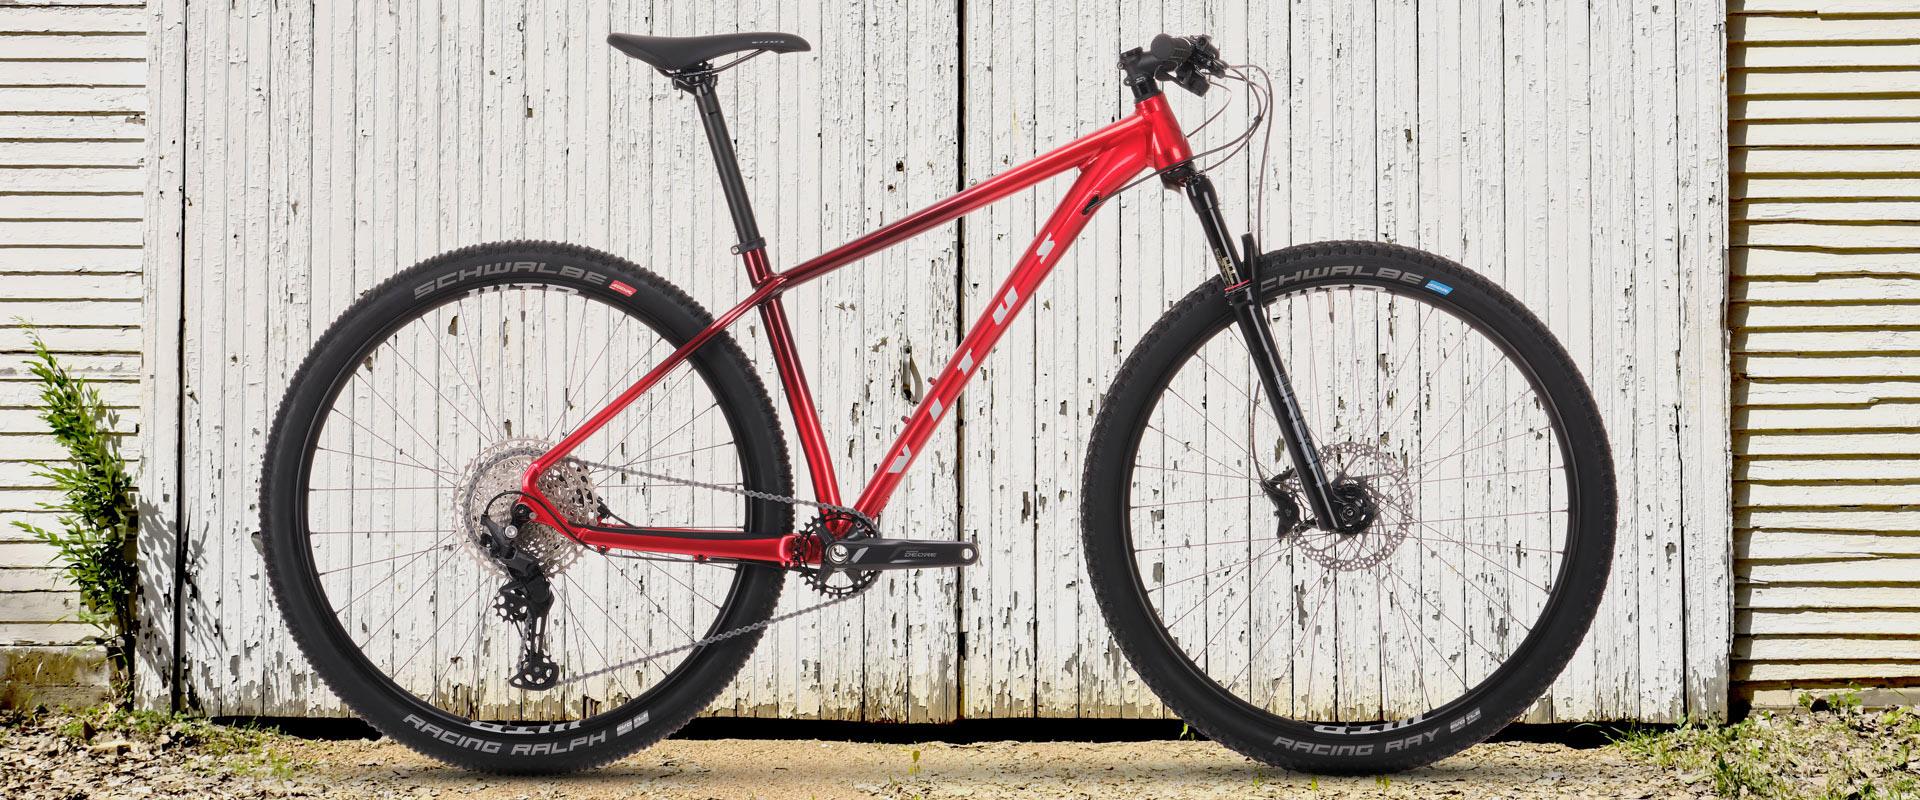 Vitus Rapide 29 VR Mountain Bike